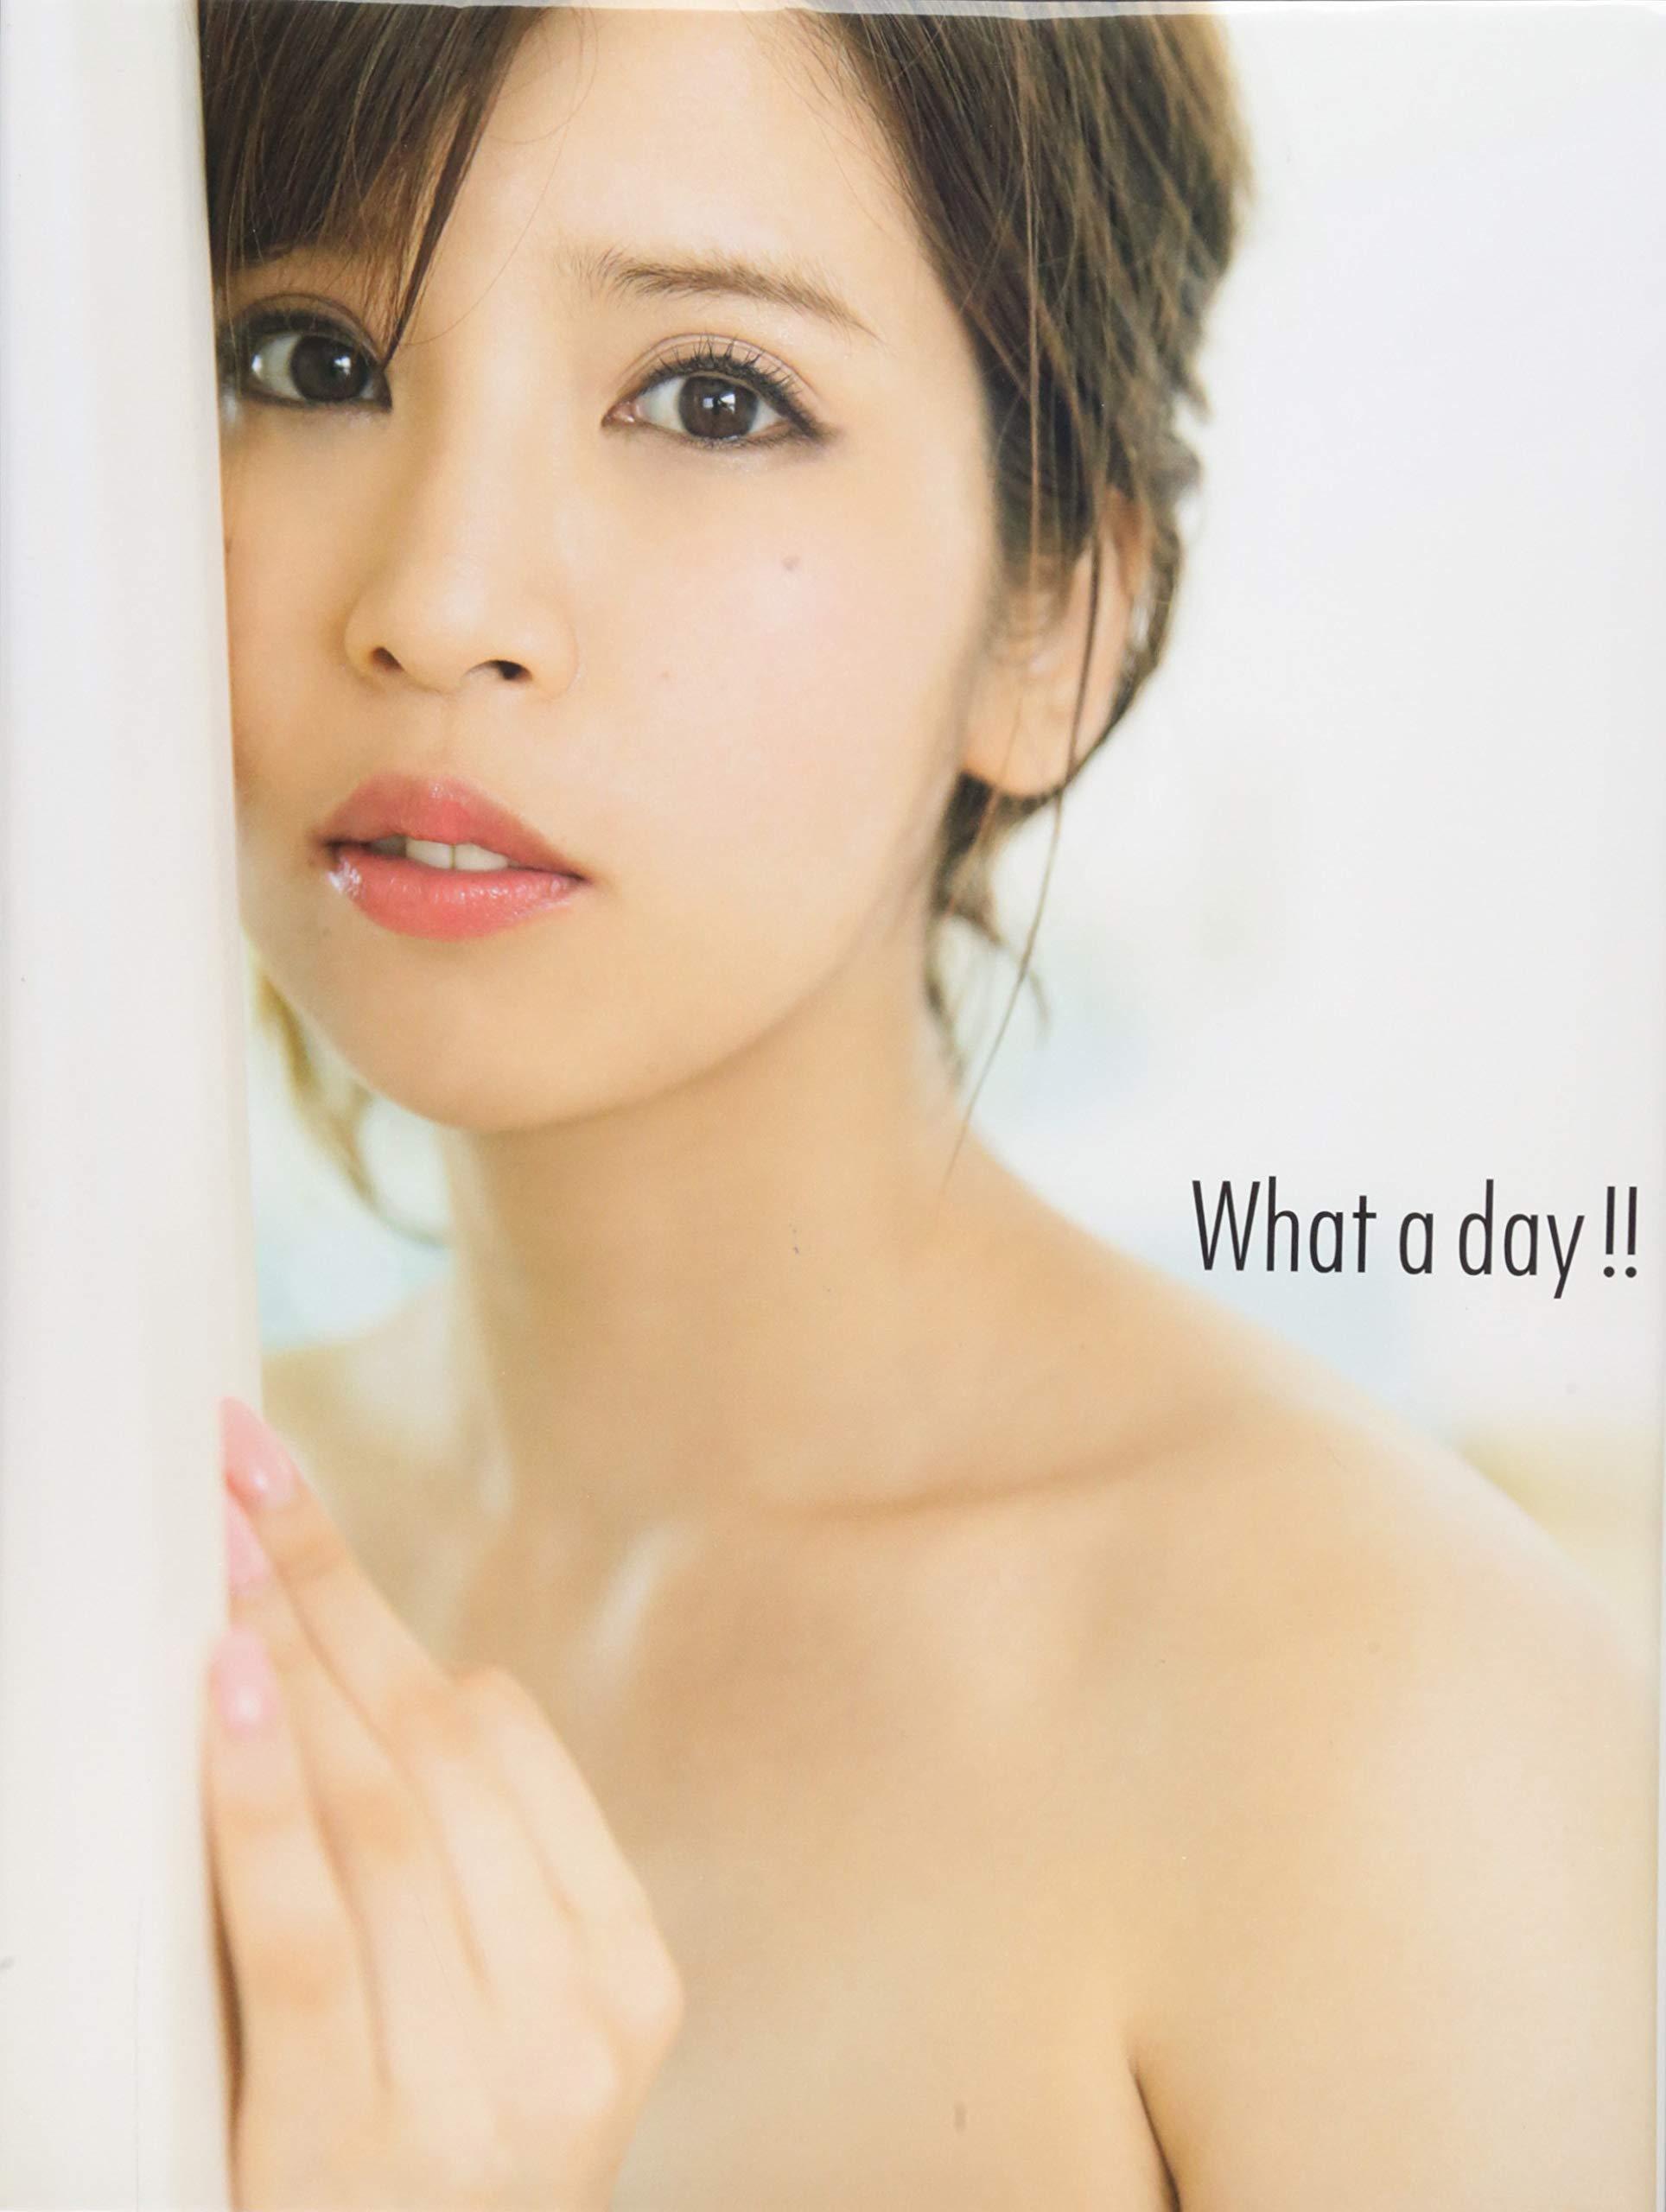 anri sakaguchi nude 写真集 ANRI) Beautiful nipples nude Oppai image 33 pictures from ...